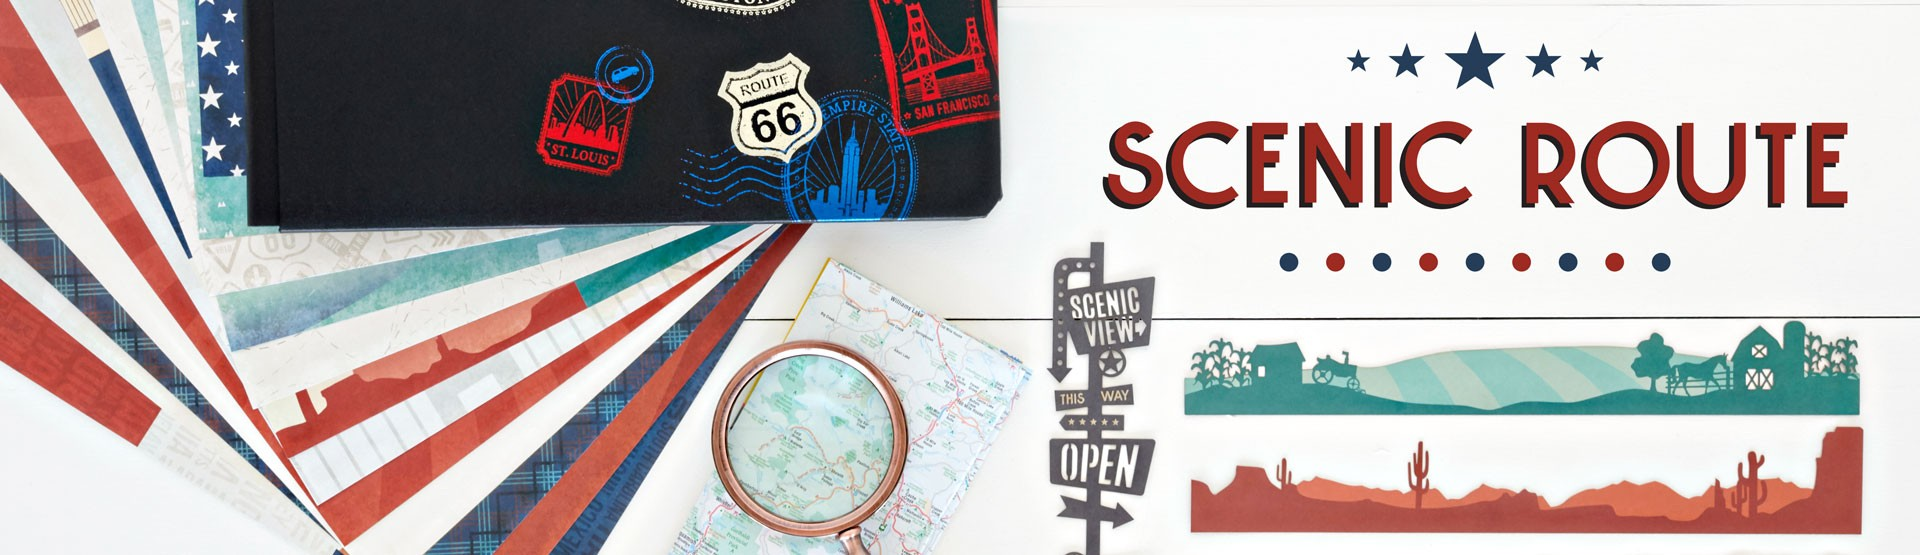 Travel & USA: Scenic Route